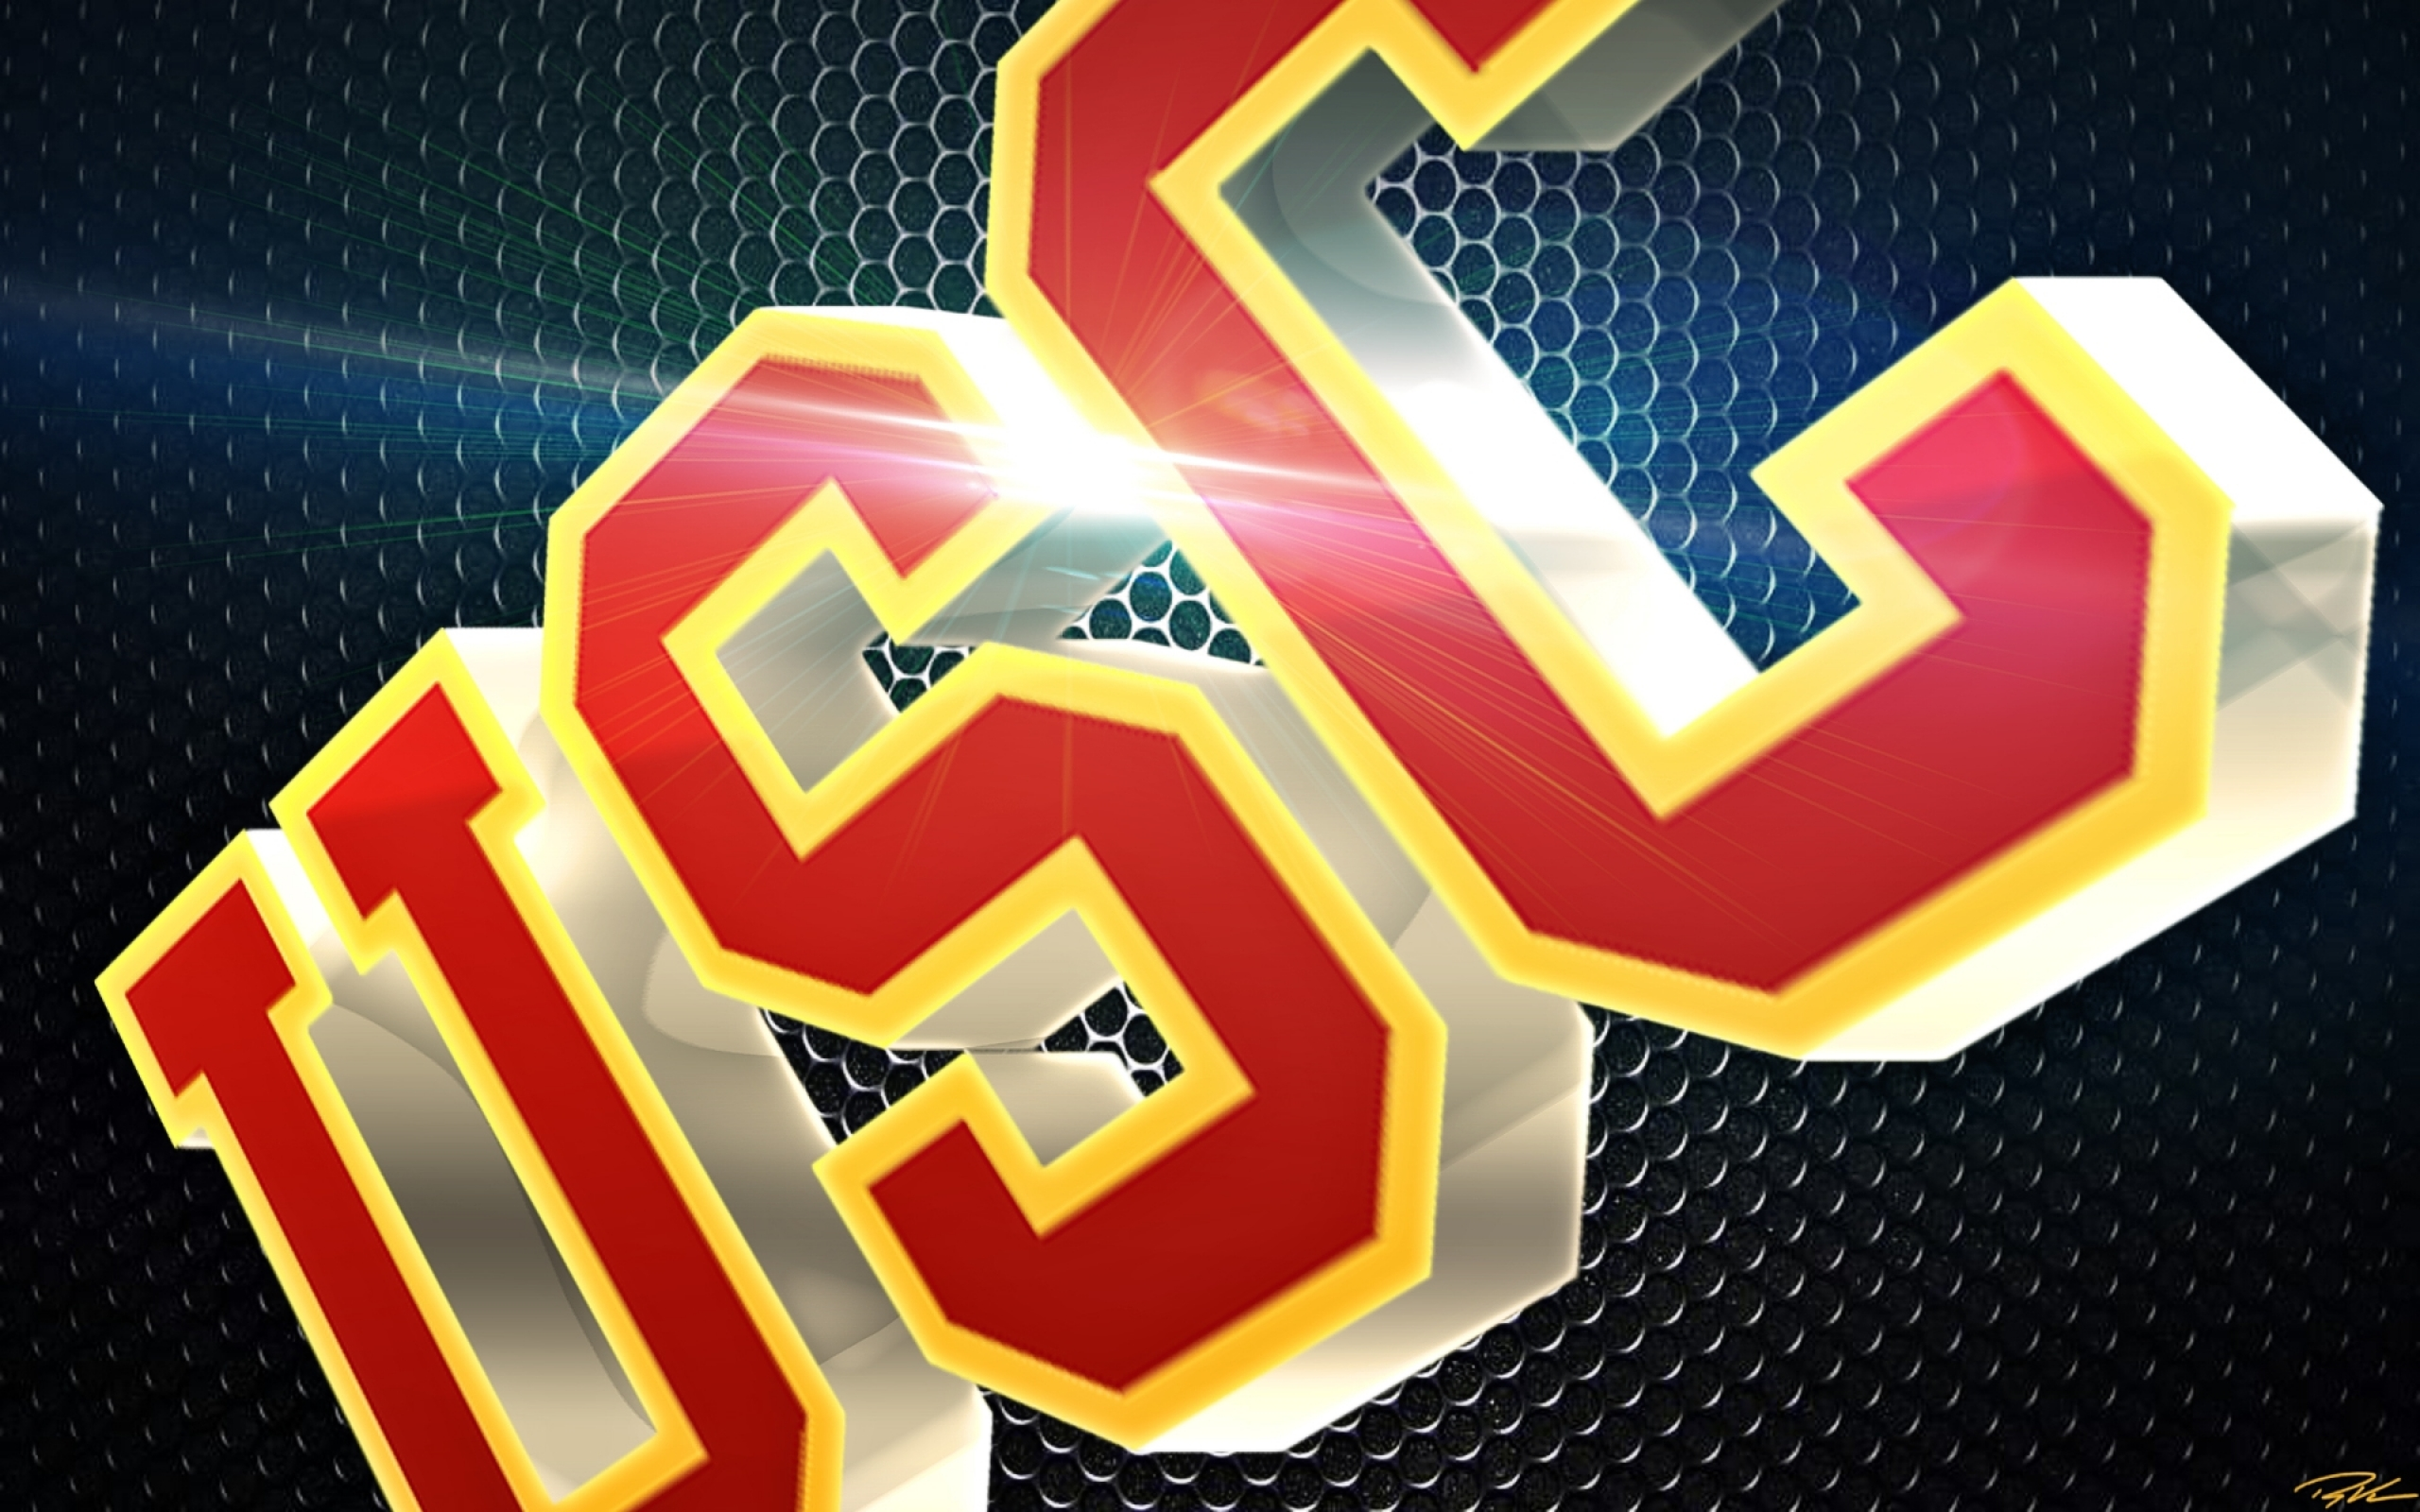 FOOTBALL NCAA USC TROJANS Wallpaper Wallpapers Download 2560x1600